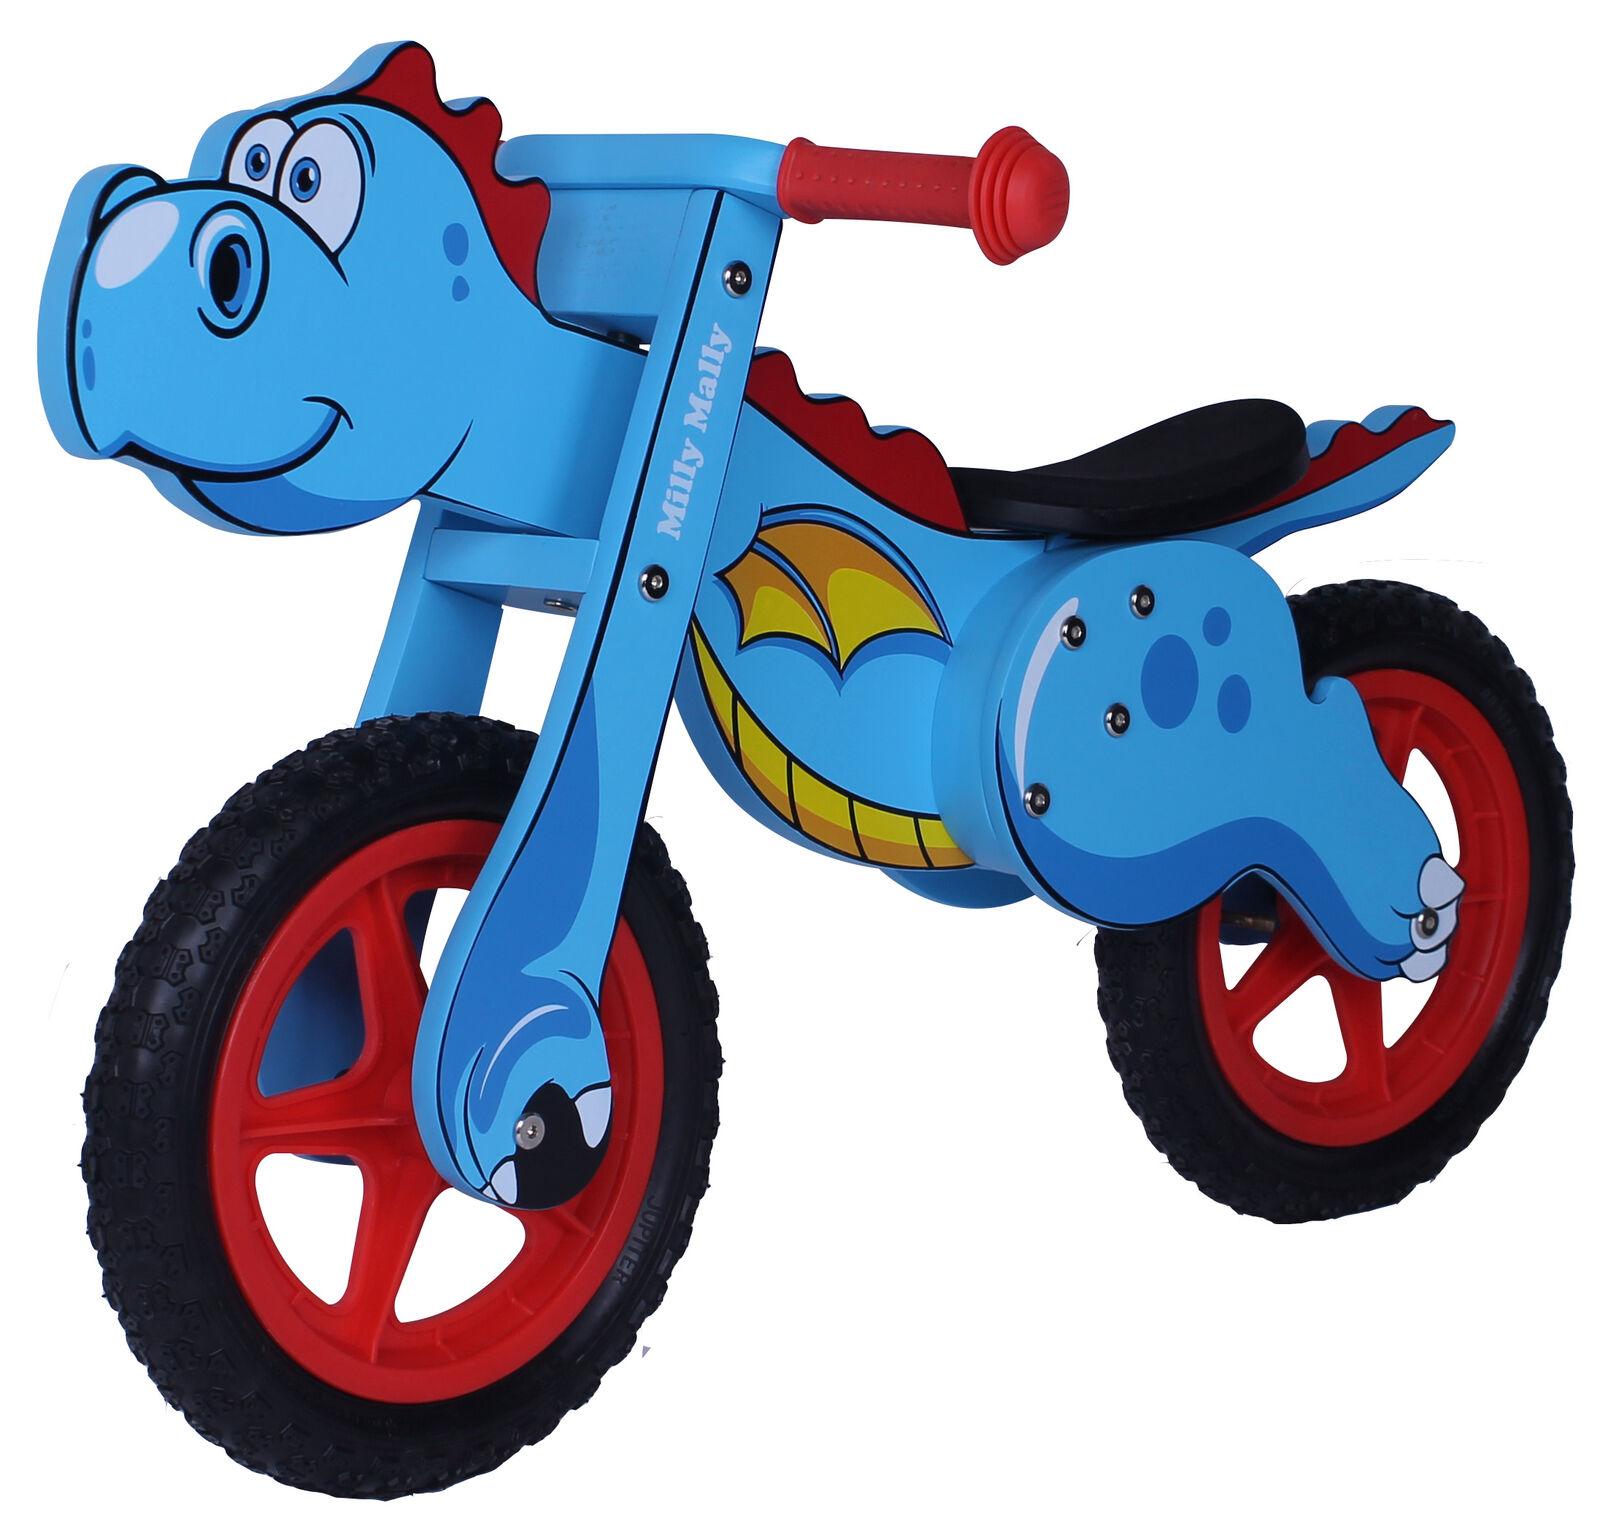 Laufrad DINO BLAU Lernrad Kinderlaufrrad Lernlaufrad Holzlaufrad Kinderfahrrad